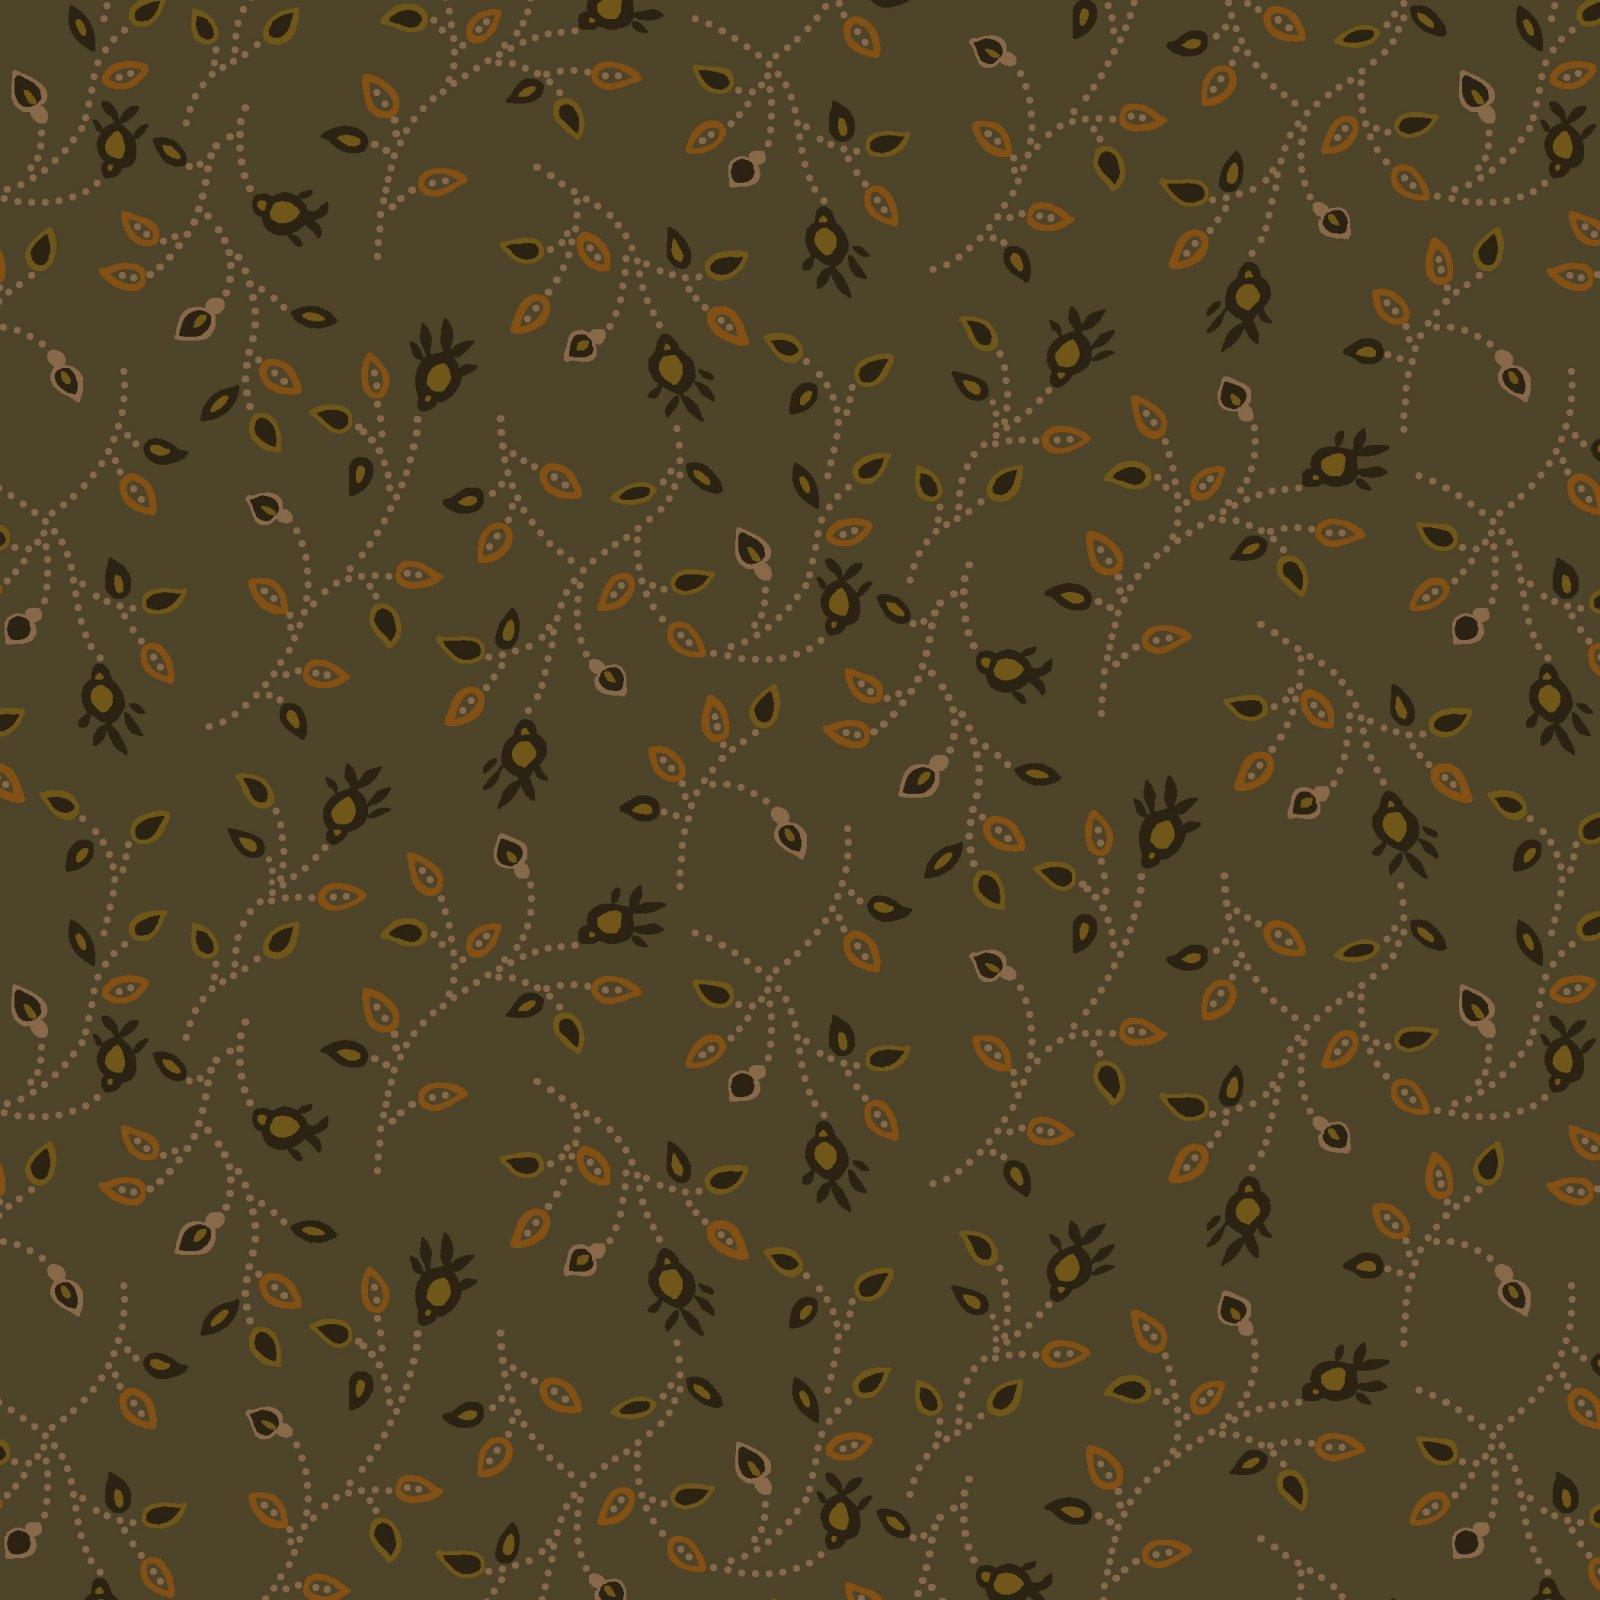 Buttermilk Autumn - 2278-66 * 1/2 yard